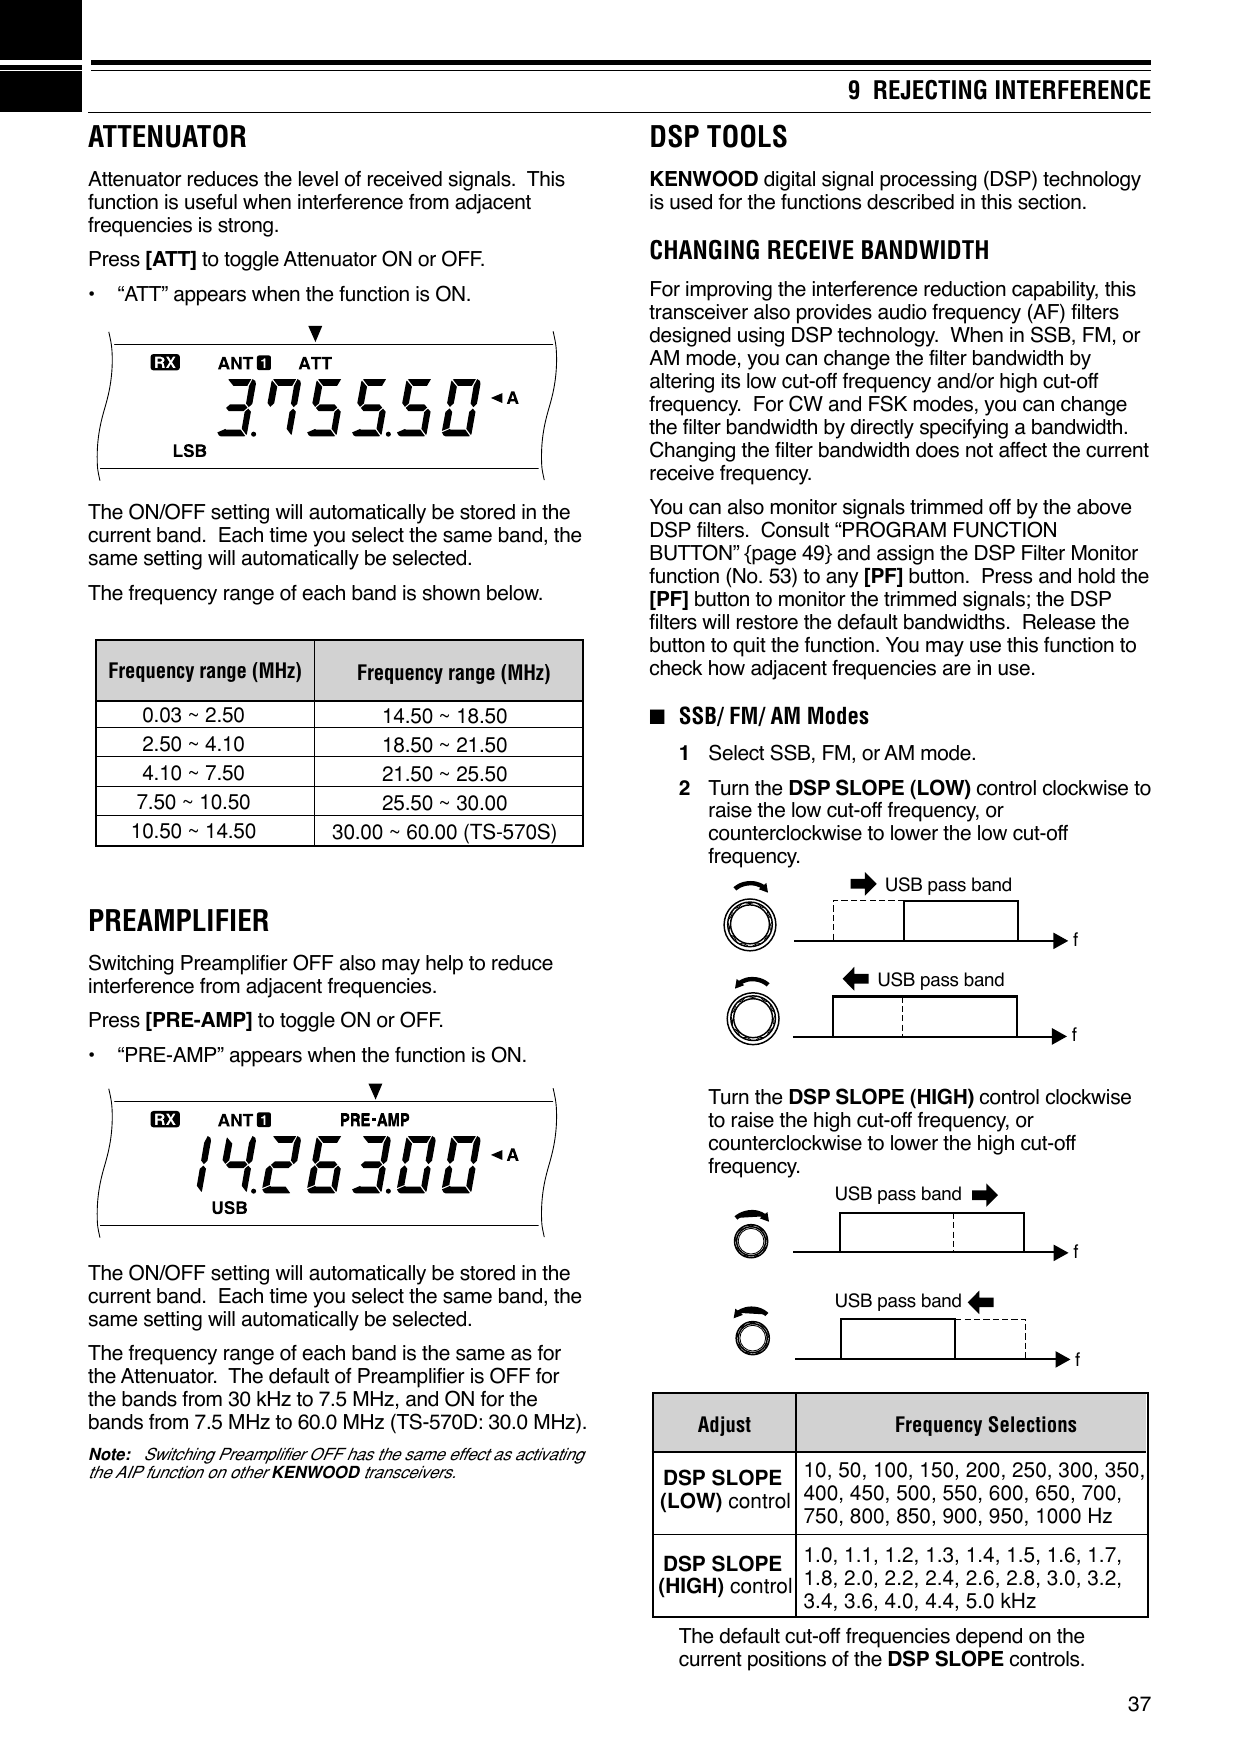 Kenwood Ts 570D Users Manual 570S_D